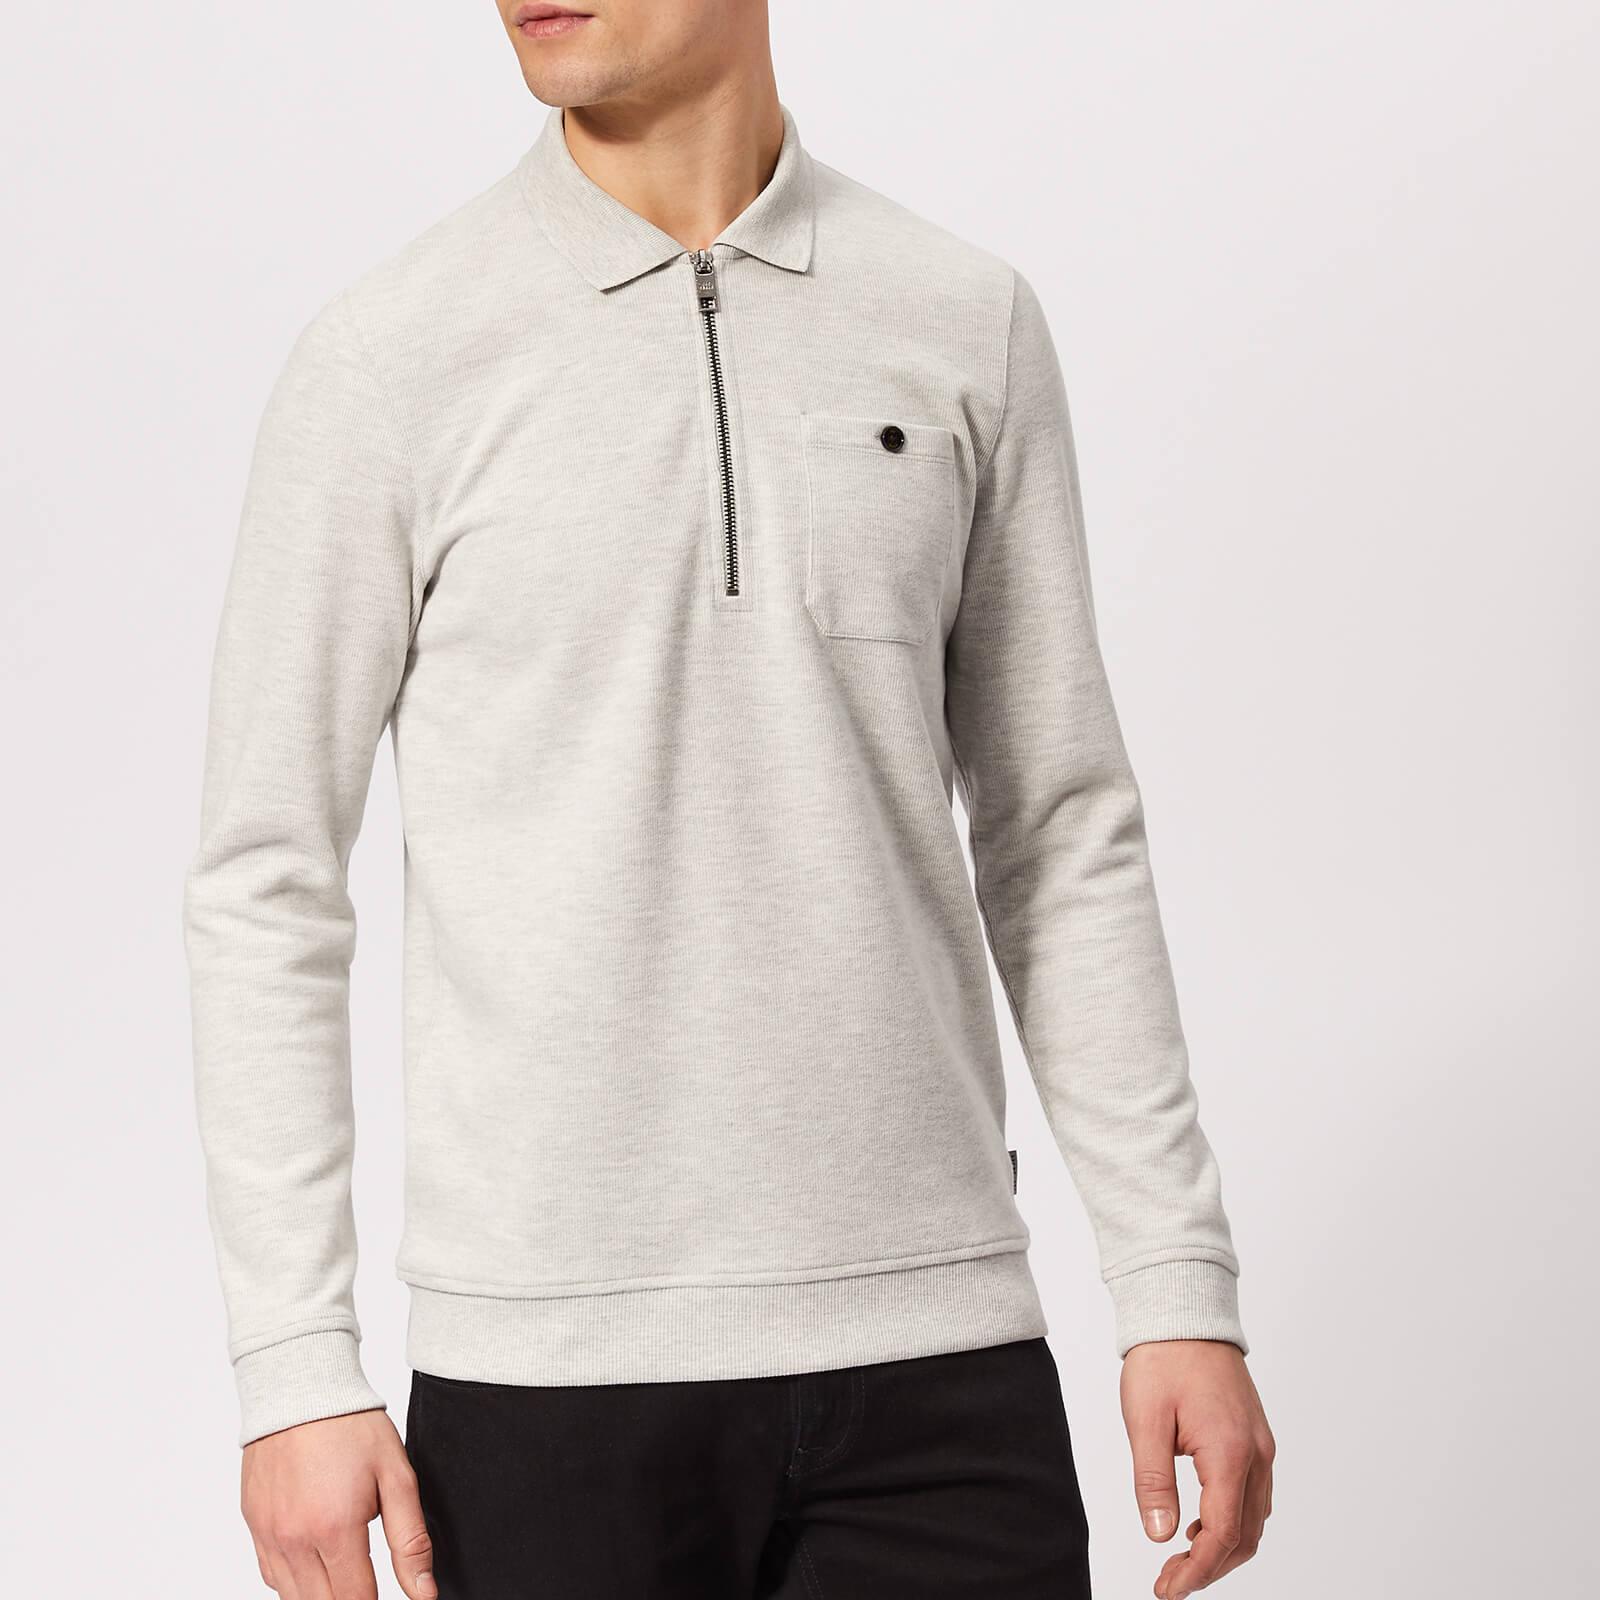 Ted Baker Men's Distres Quarter Zip Sweatshirt - Natural - 5/XL - Grey